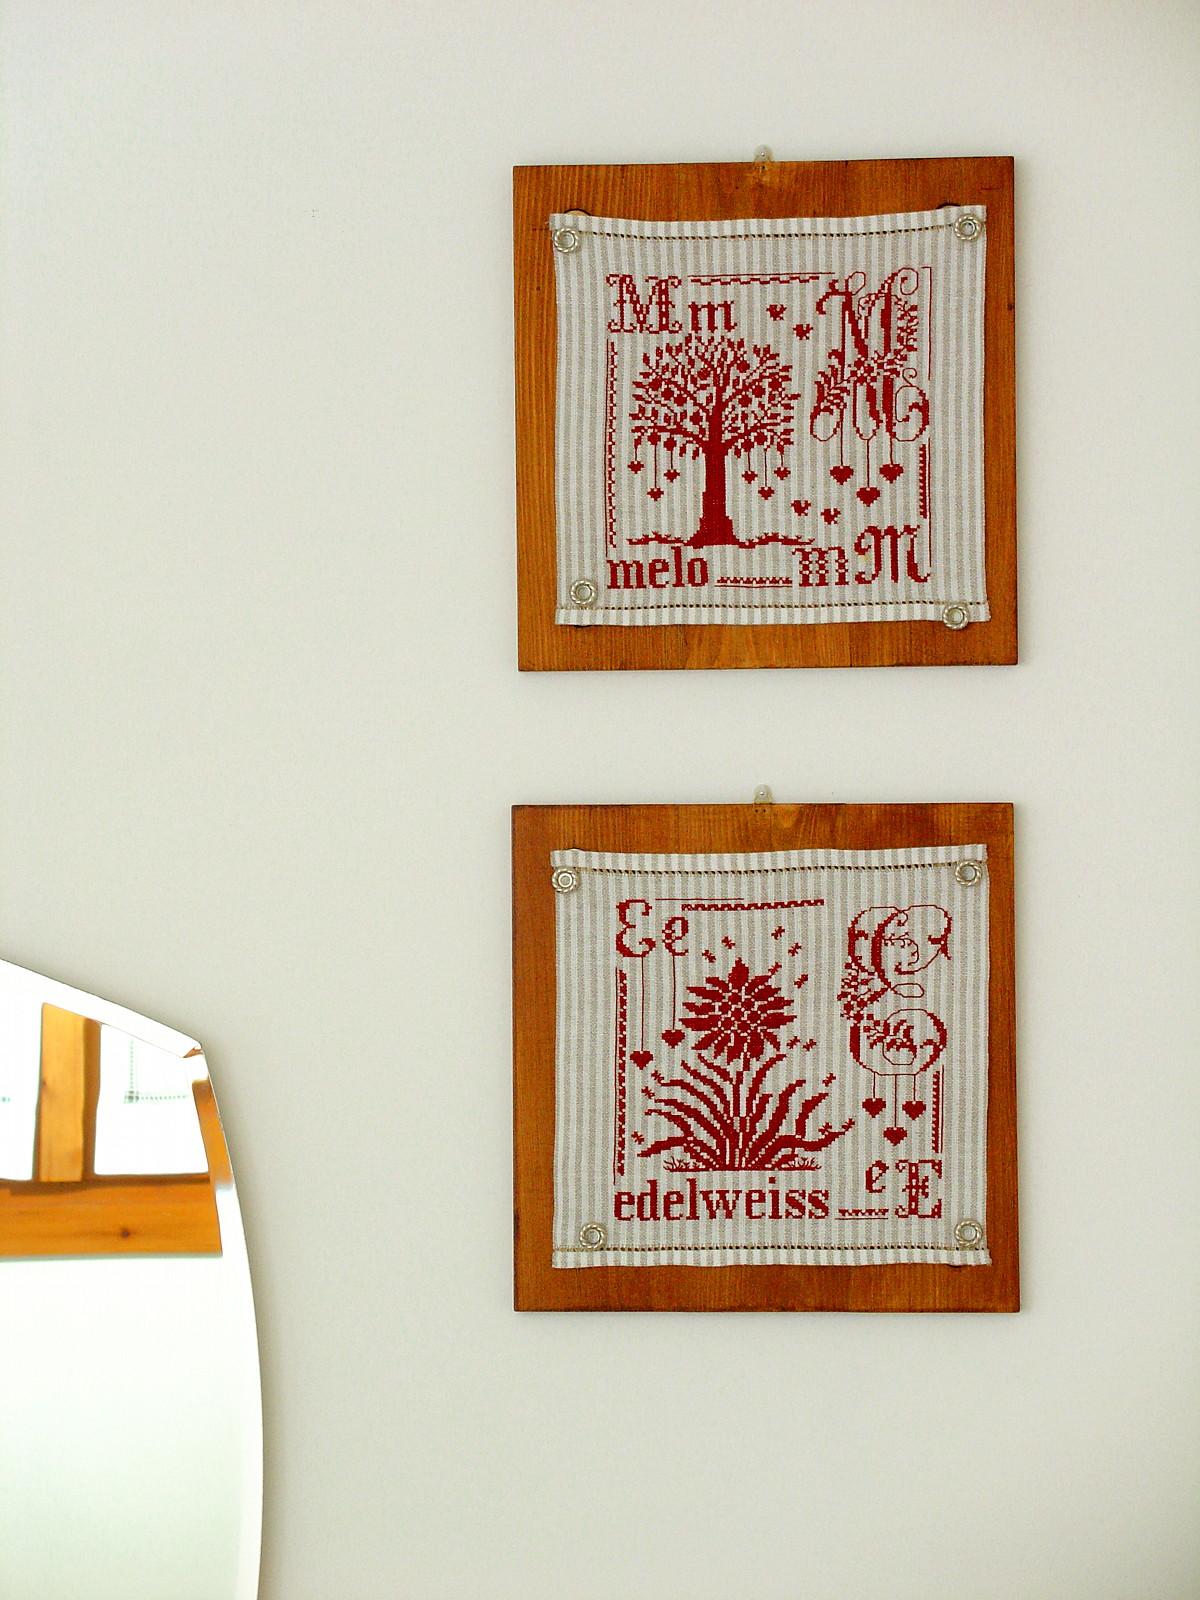 medium resolution of hd wallpapers wiring diagram hair dryer